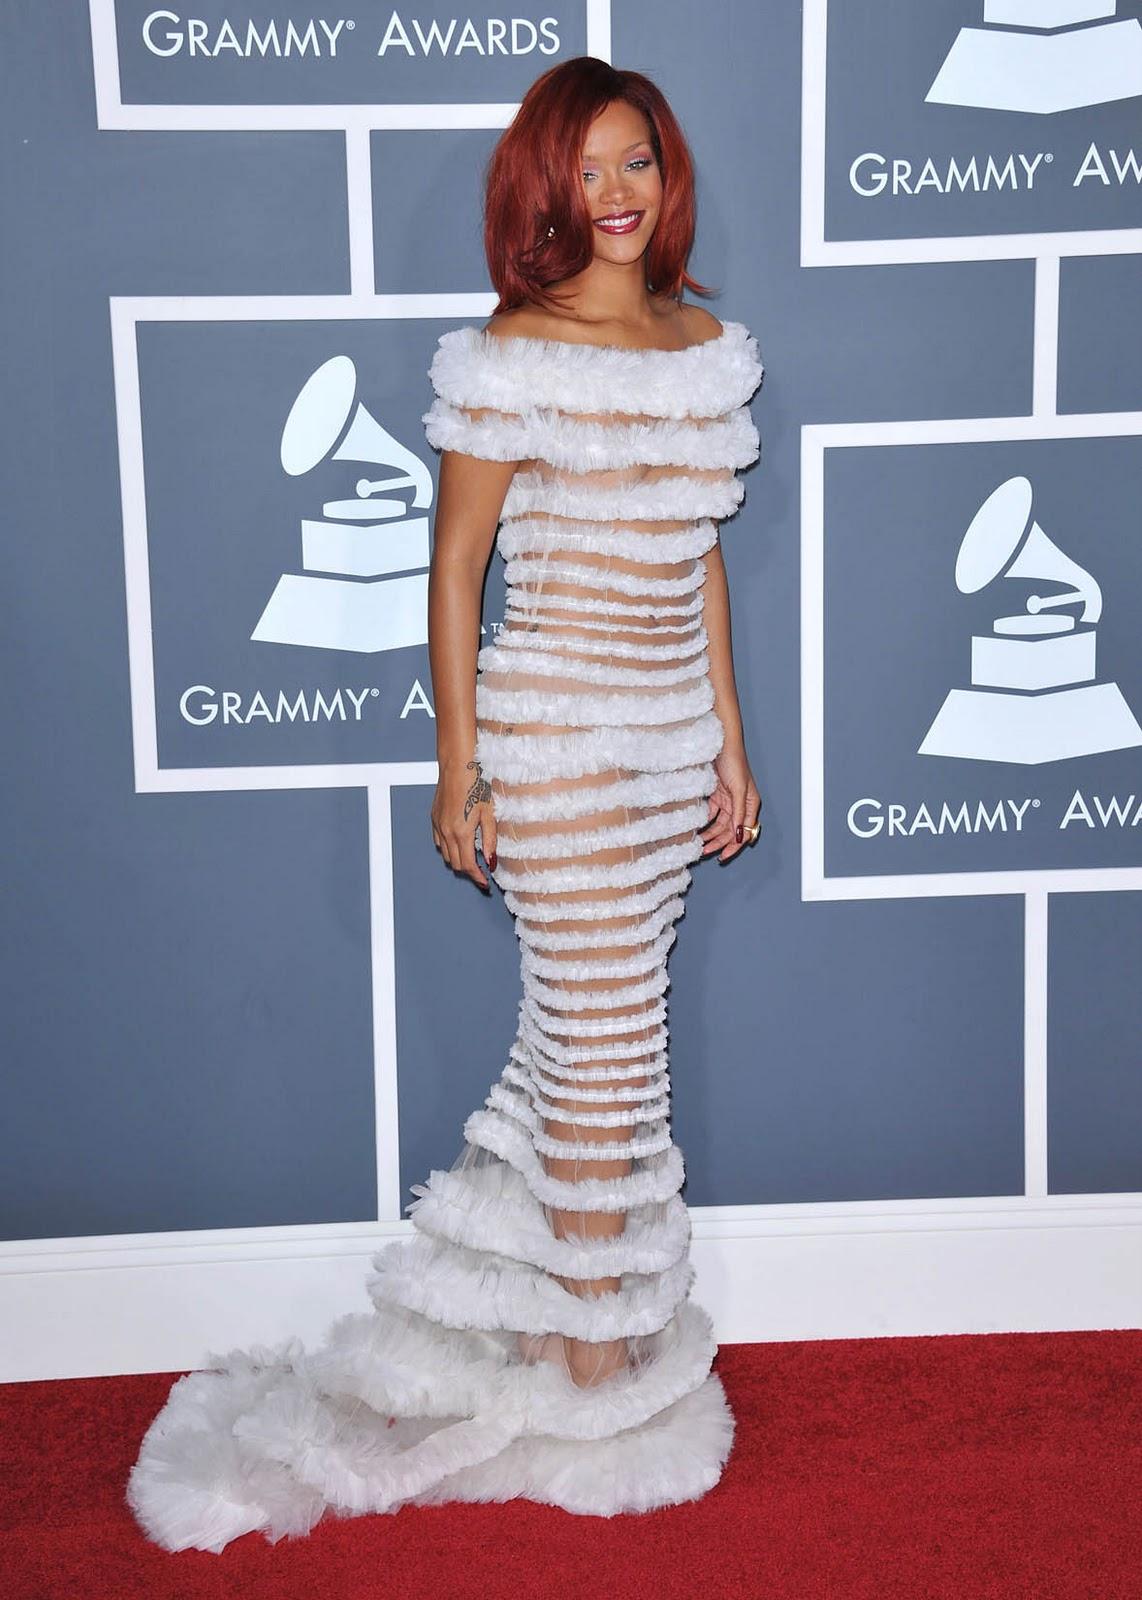 Silvi Celebrities Blog: RIHANNA SEE THROUGH WHITE DRESS